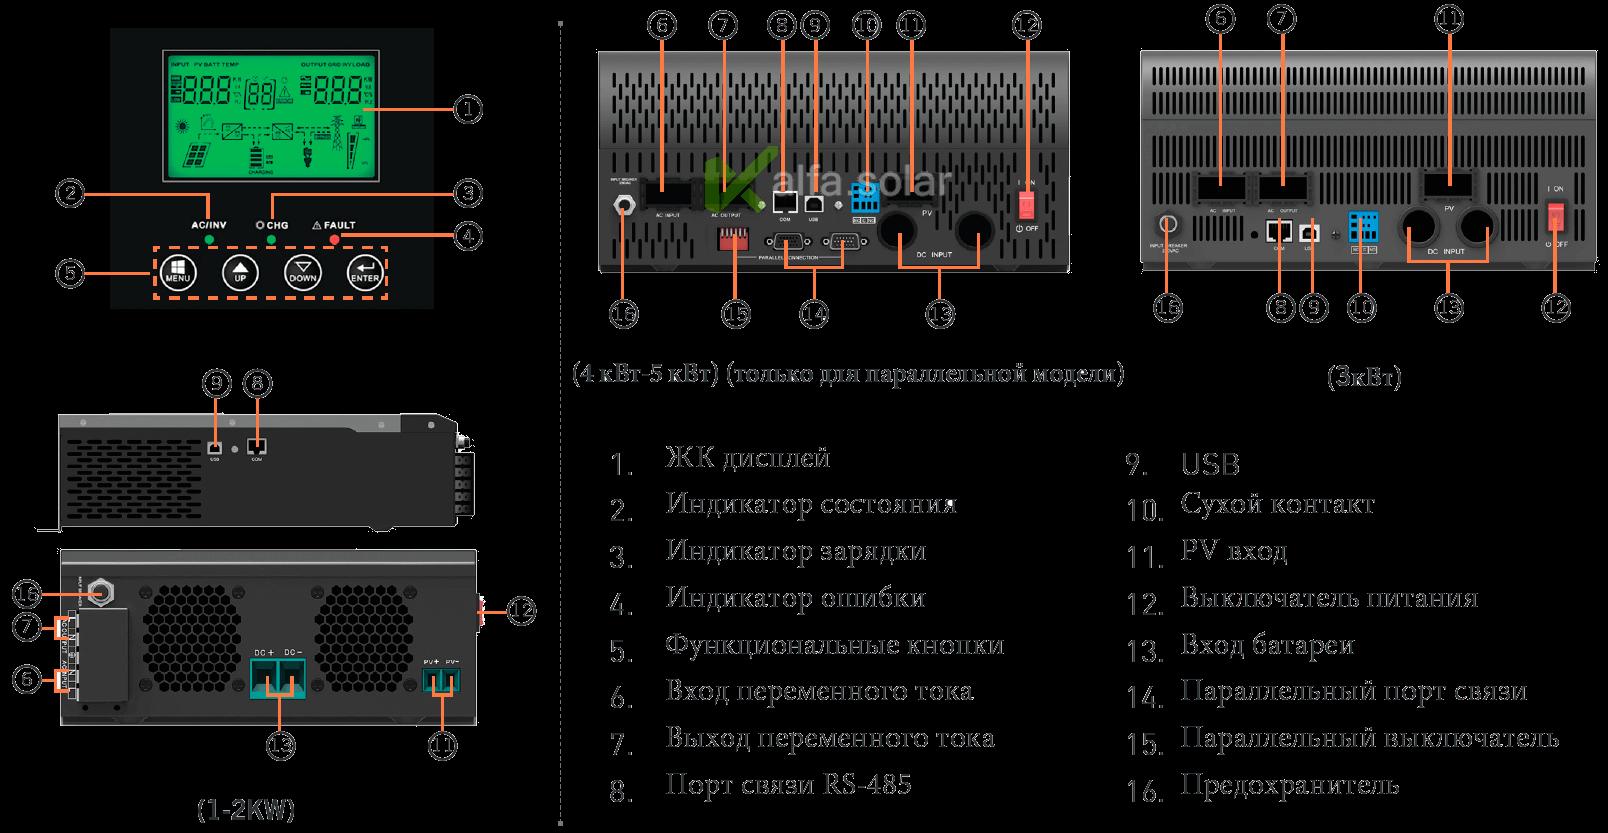 PV1800 VPK (1-5 кВт) дисплей